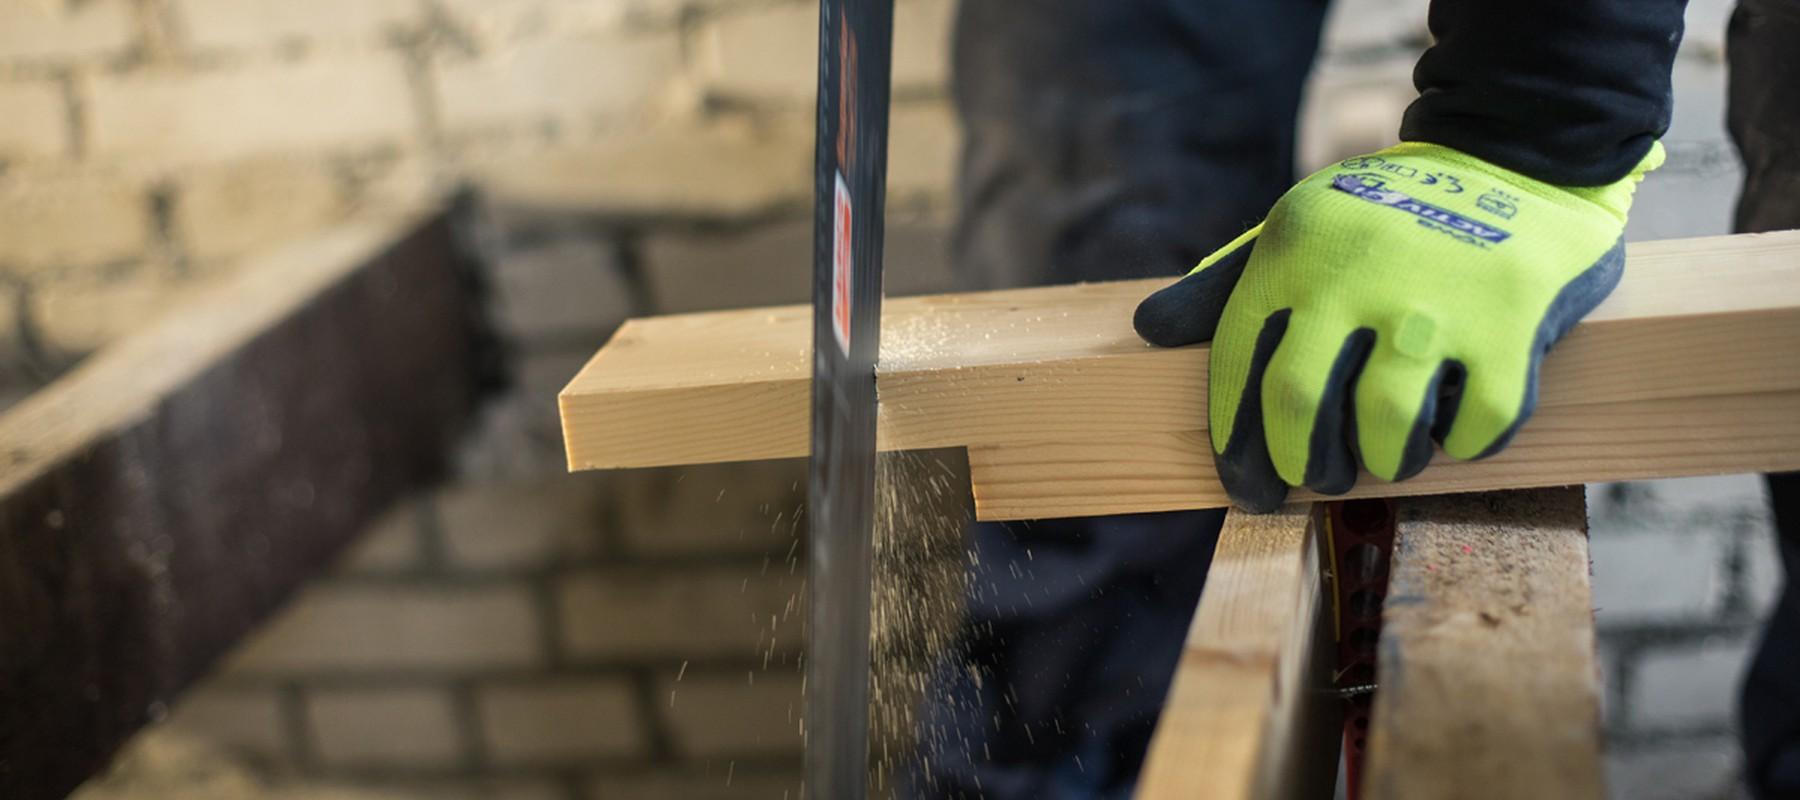 Blog: Een woning inbraakveilig maken met hang- en sluitwerk? Vijf keer inbraakwerend deurbeslag